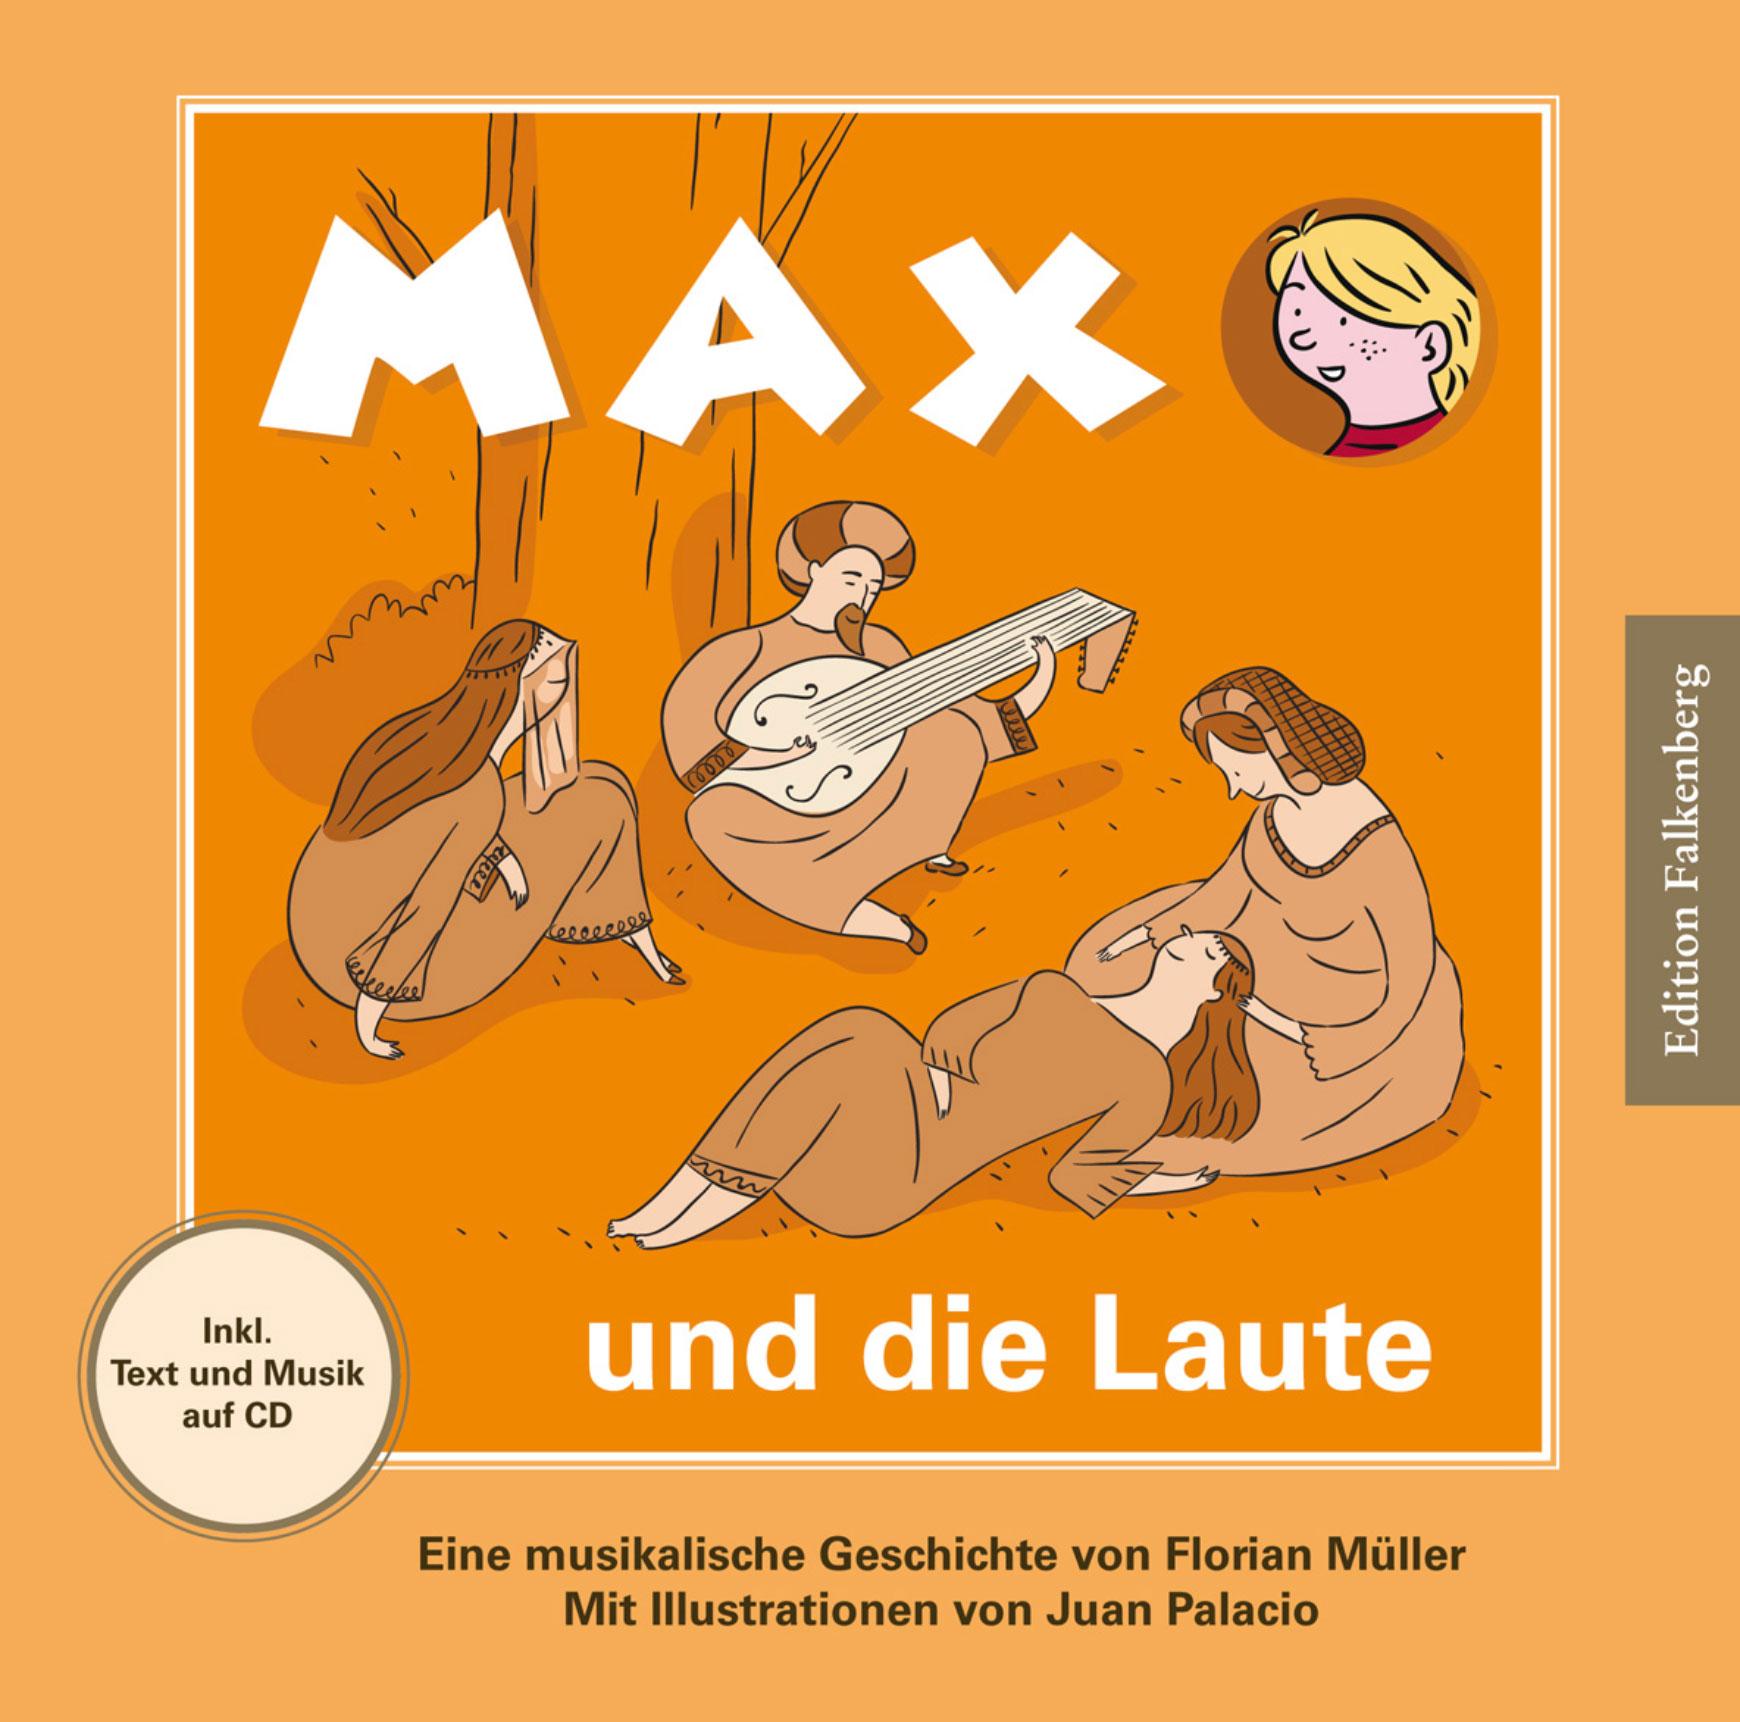 Edition Falkenberg © Florian Müller